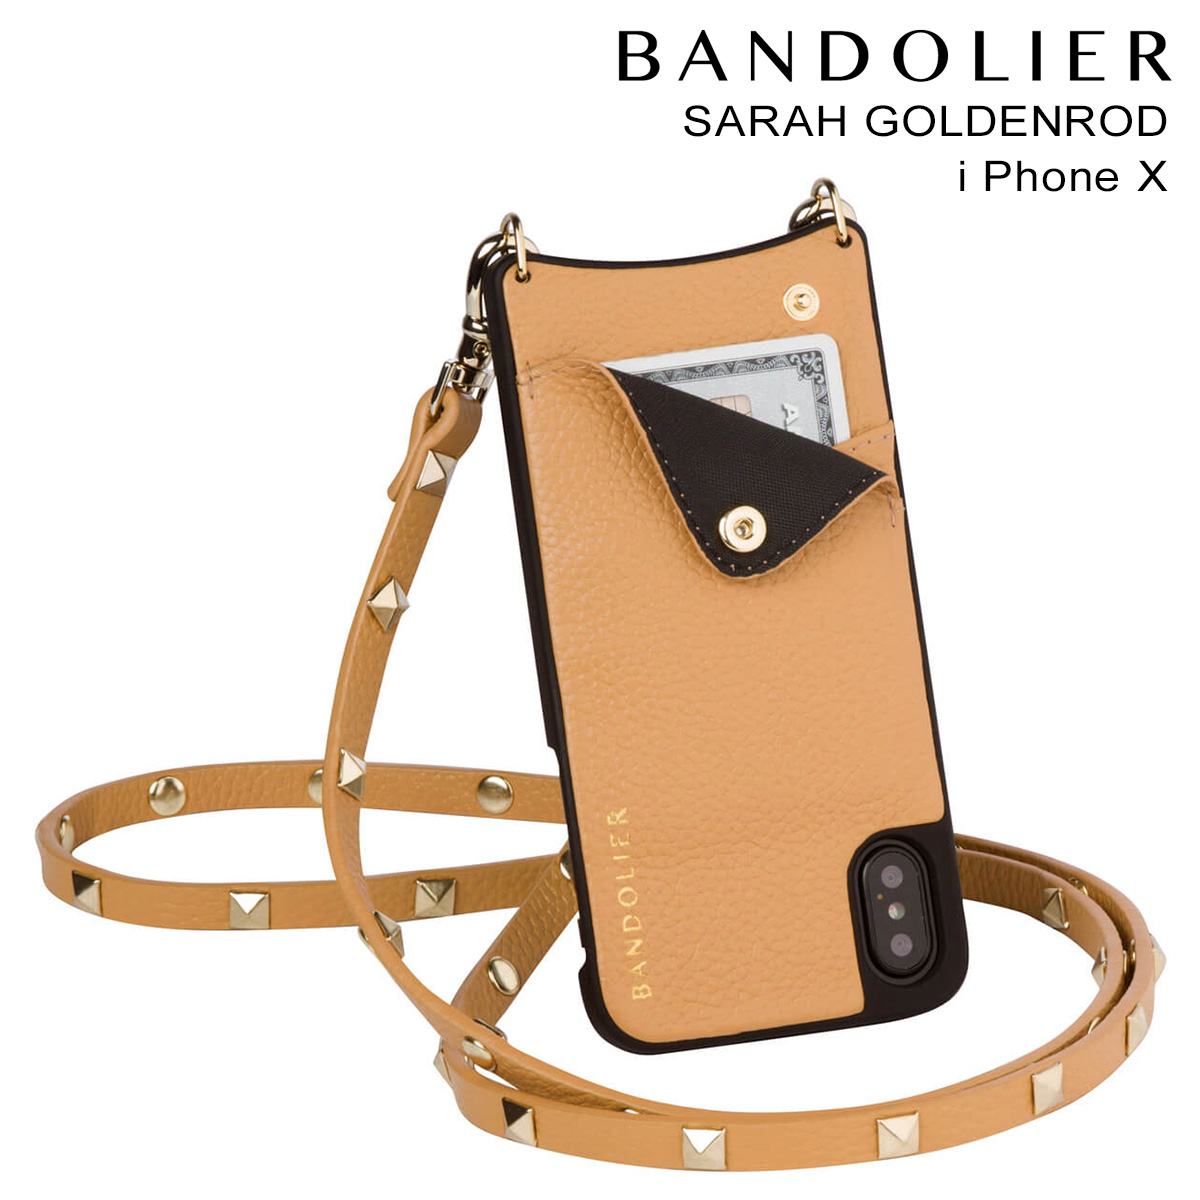 BANDOLIER iPhoneX SARAH GOLDENROD バンドリヤー ケース スマホ アイフォン レザー メンズ レディース